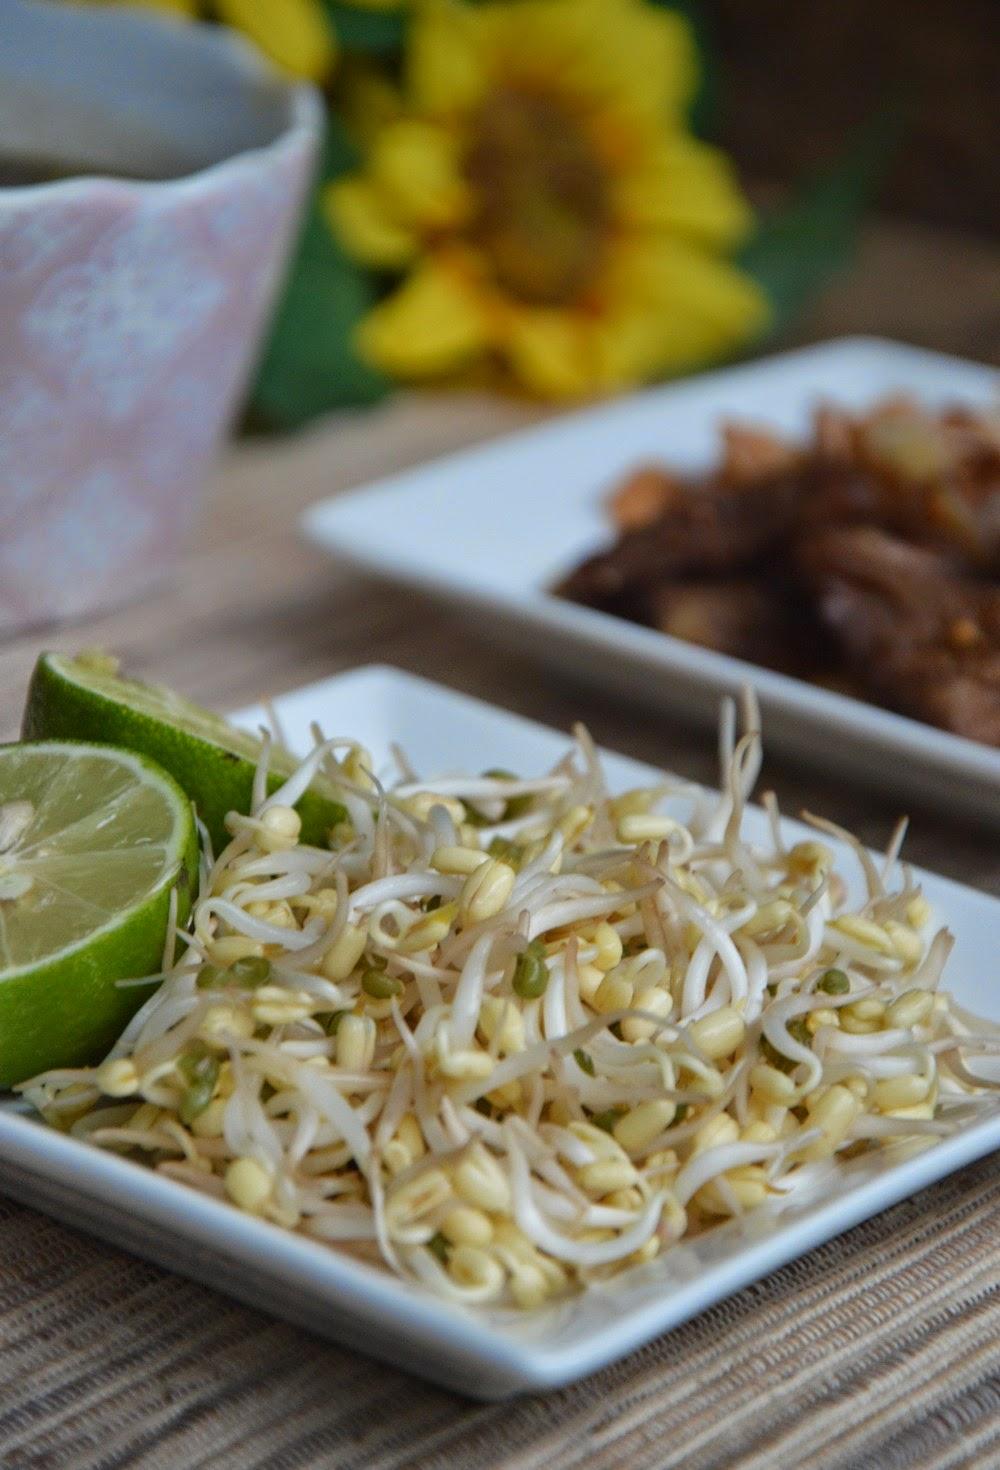 Diah Didis Kitchen Rawon Empal Goreng Nastar By Pak Jojo Sby Suwir Pangat Surabaya Udah Ku Fotoin Ya Resepnyakalau Mau Coba Pakai Resep Ala Kau Juga Bolehtinggal Klik Aja Resepnya Di Sini